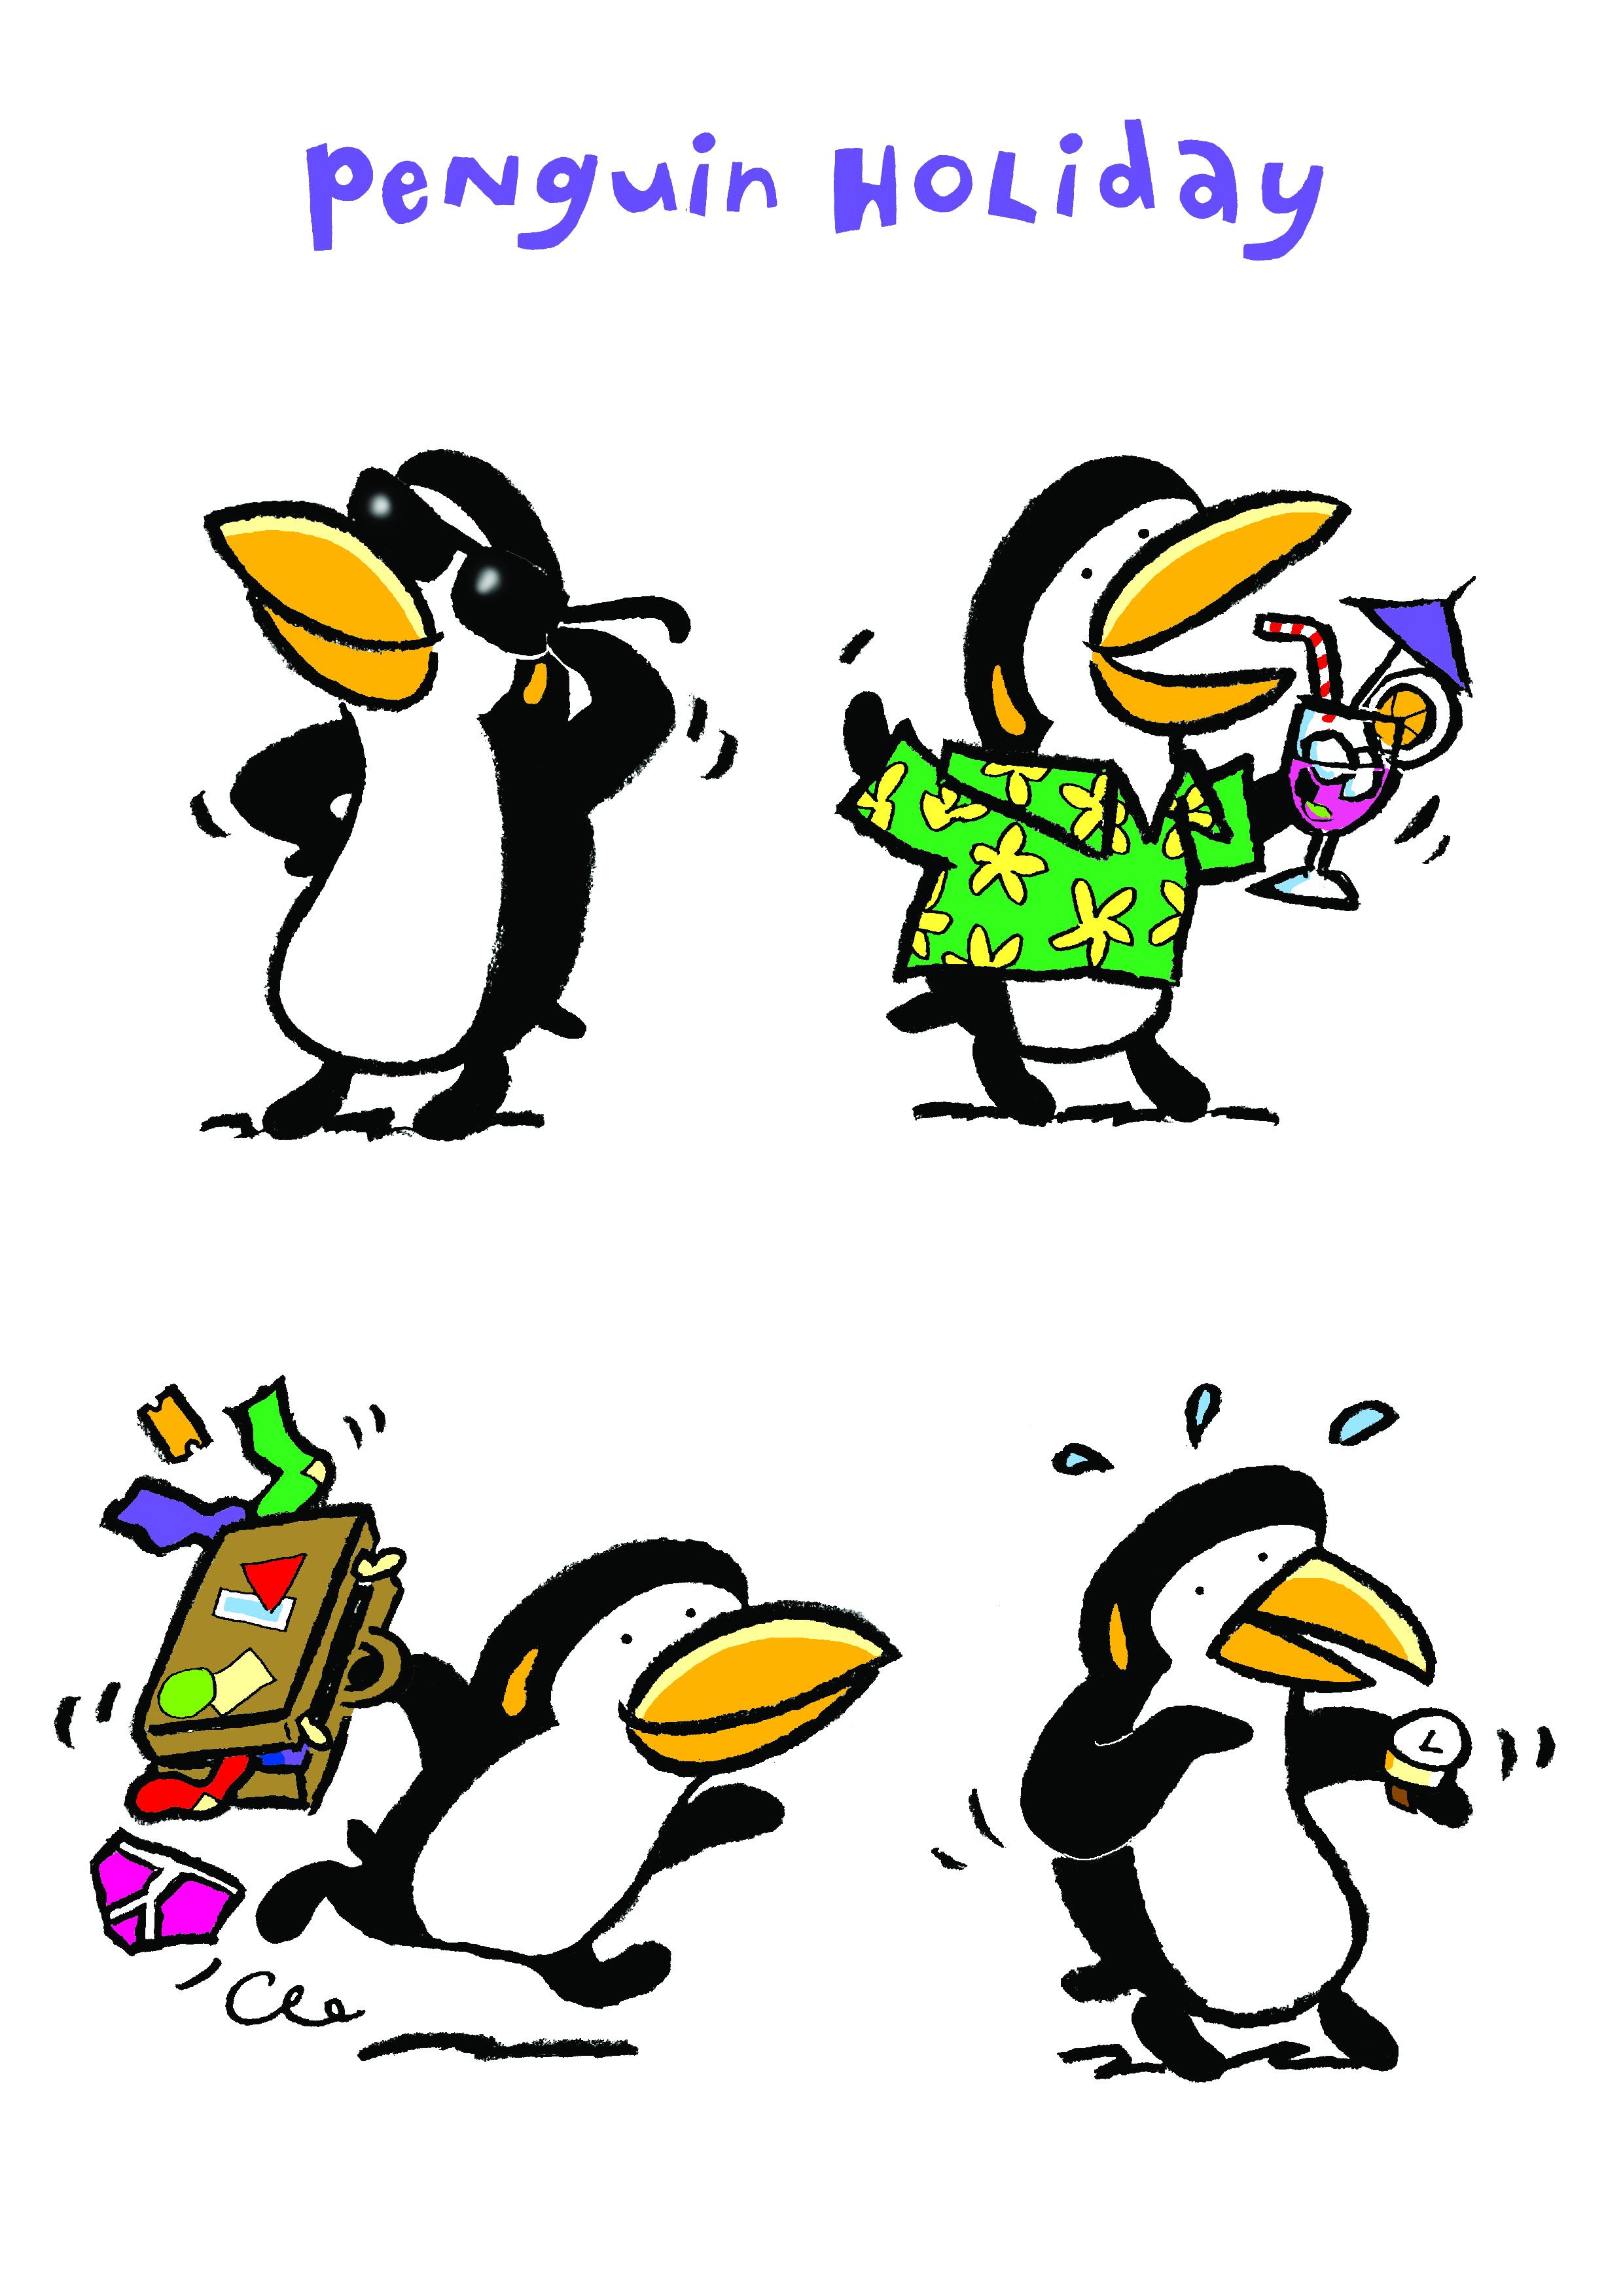 Penguin Holiday copy.jpg